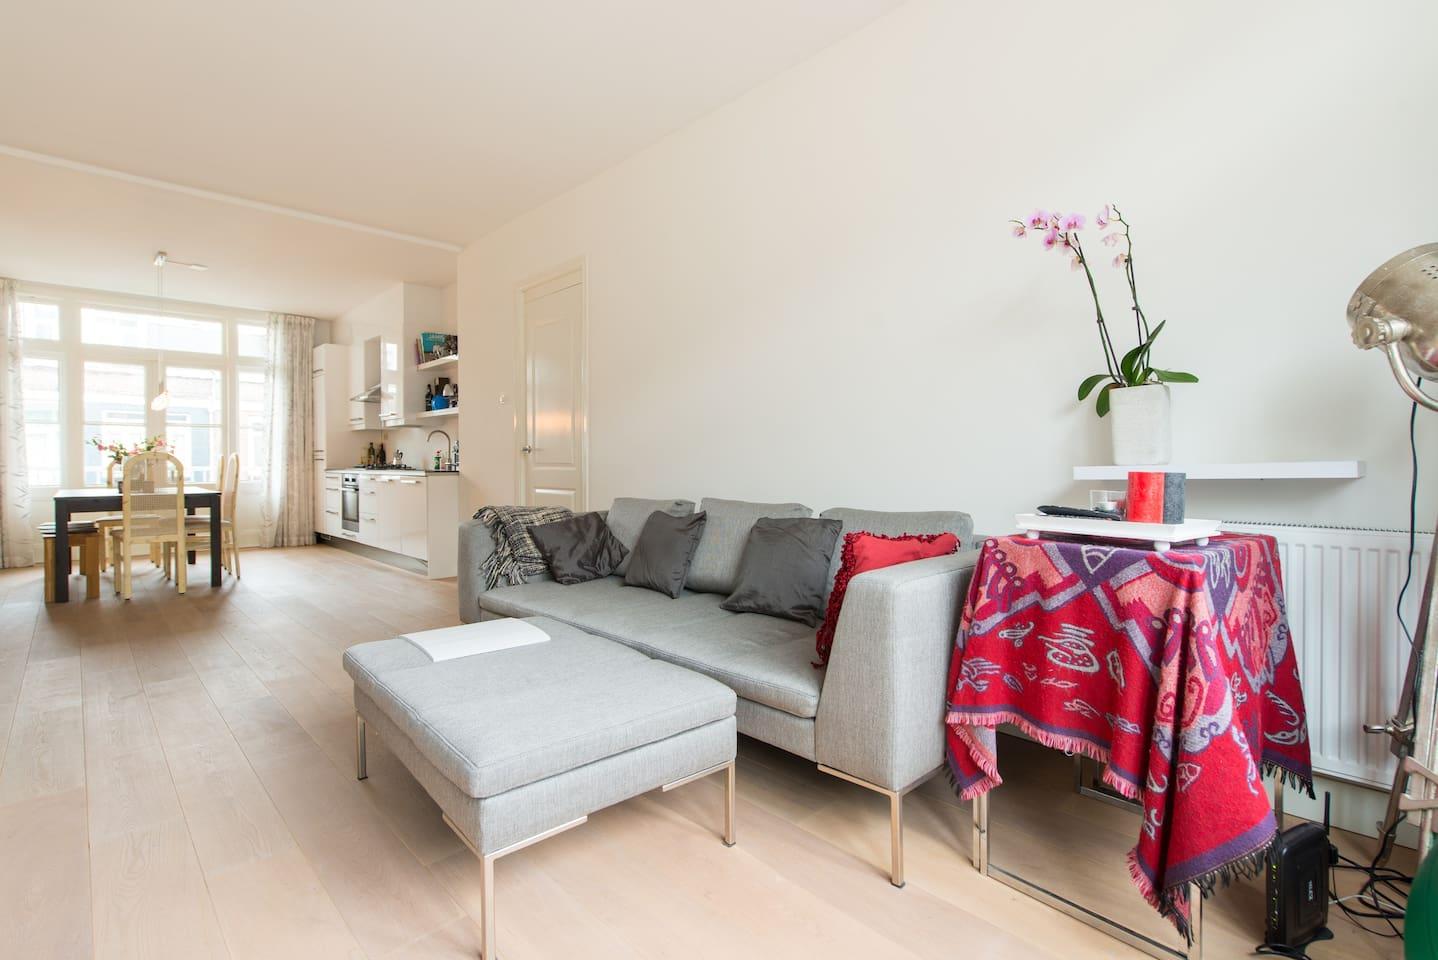 Bright living/kitchen with balcony at front and in the back of the apartment - Doorzon woonkamer/open keuken met balkon voor en achter